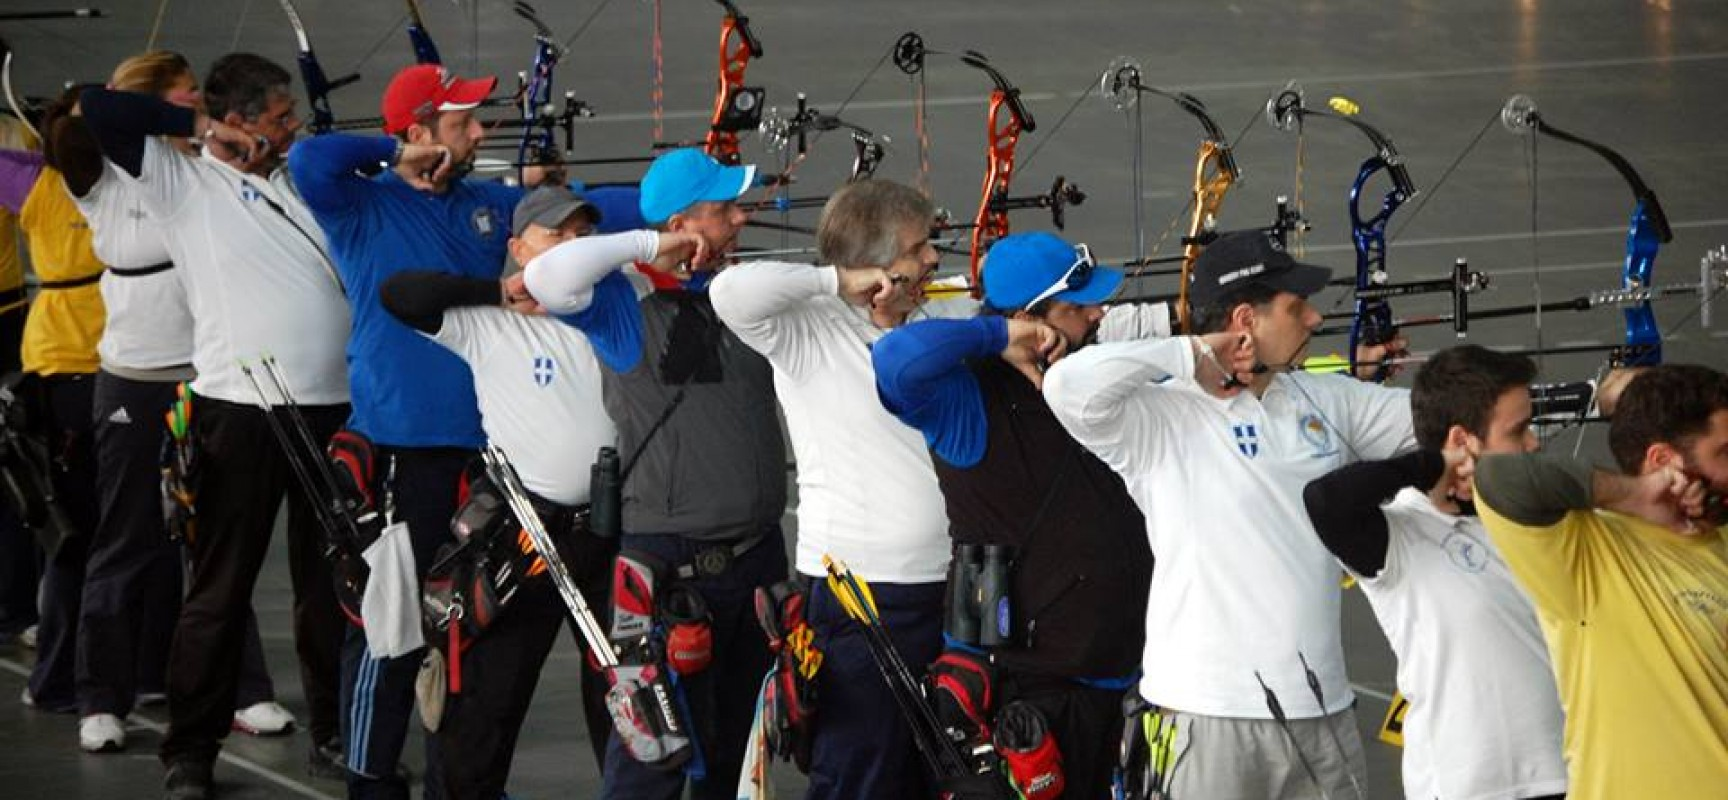 Invitation Andorra International Open for VI Archery – 26-29 September 2019